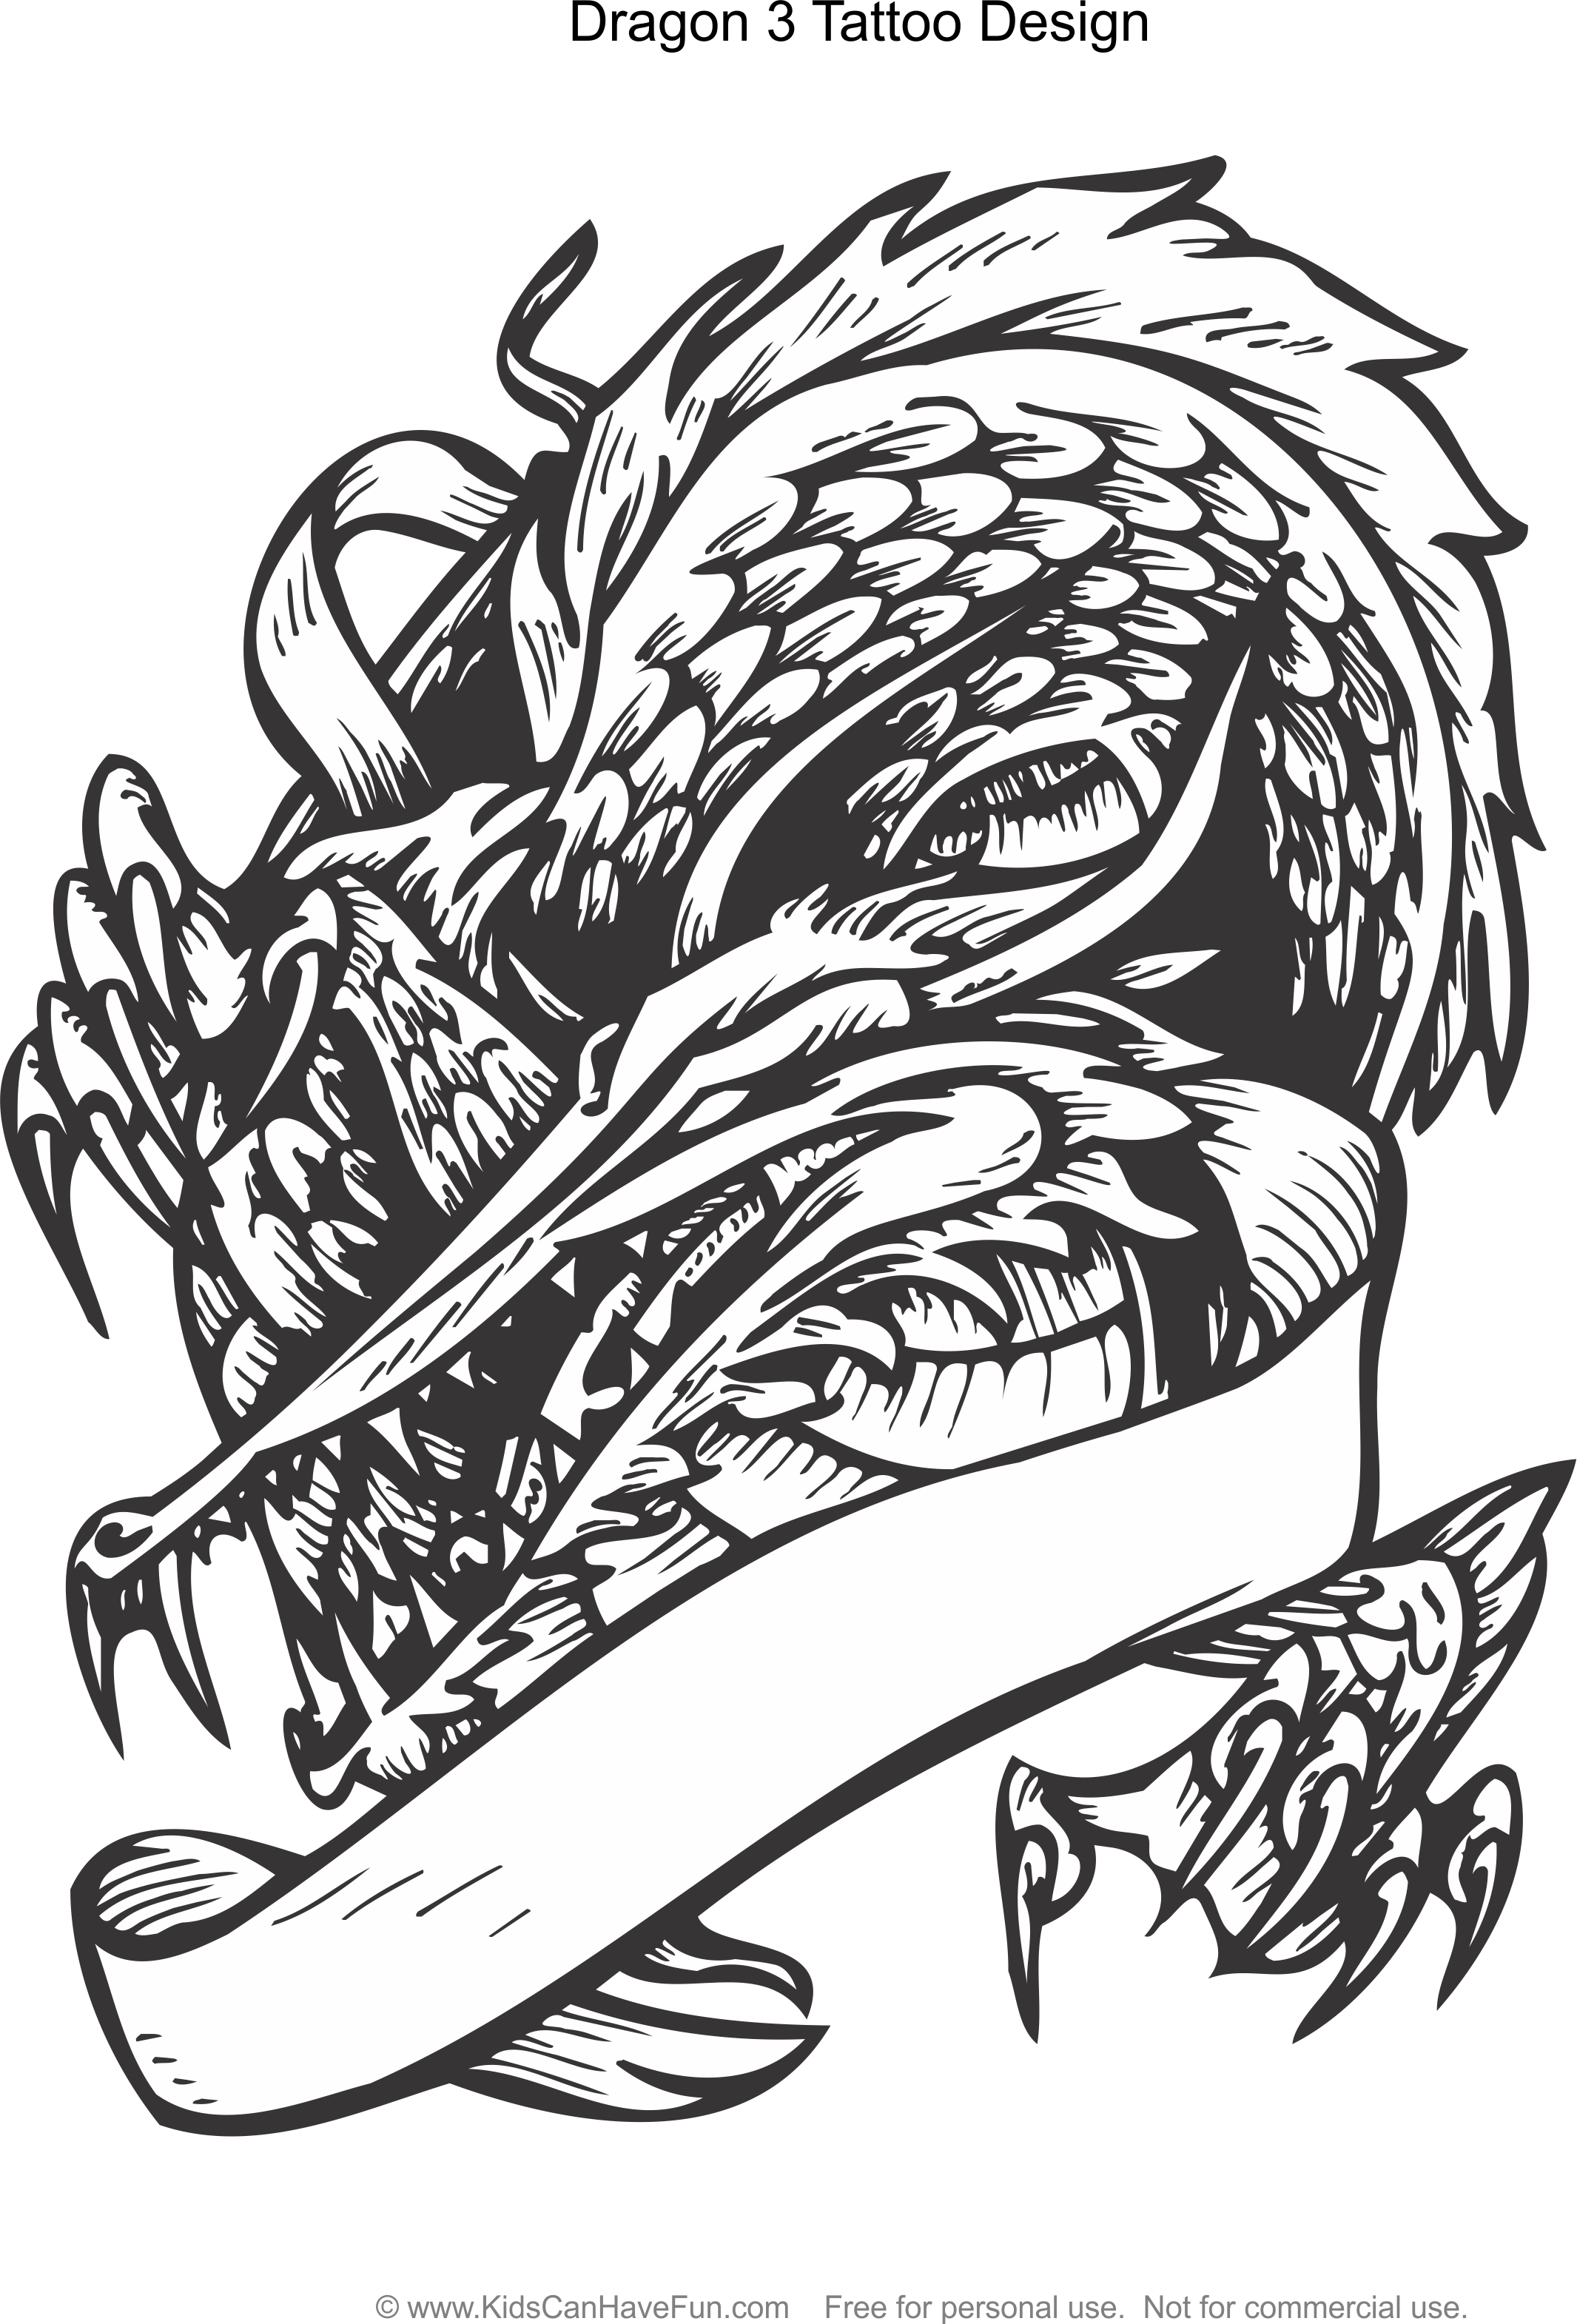 Dragon 3 Tattoo Design Coloring Page Kidscanhavefun